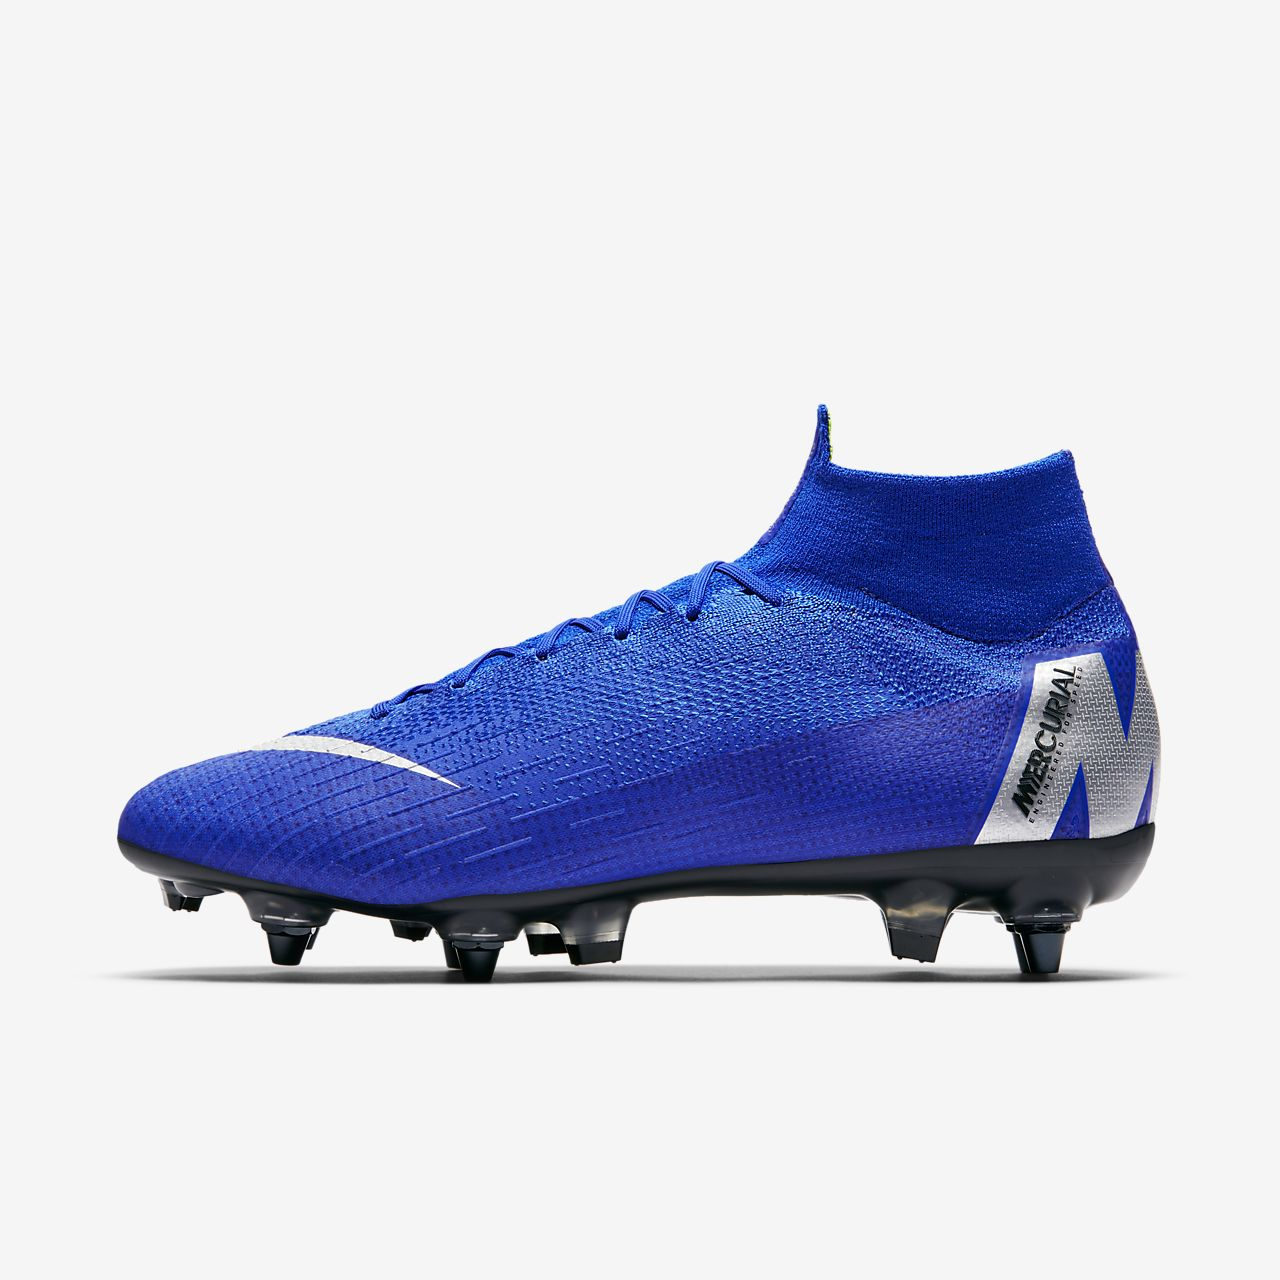 Nike Mercurial Superfly 360 Elite SG-PRO Anti-Clog Soft-Ground Football Boot